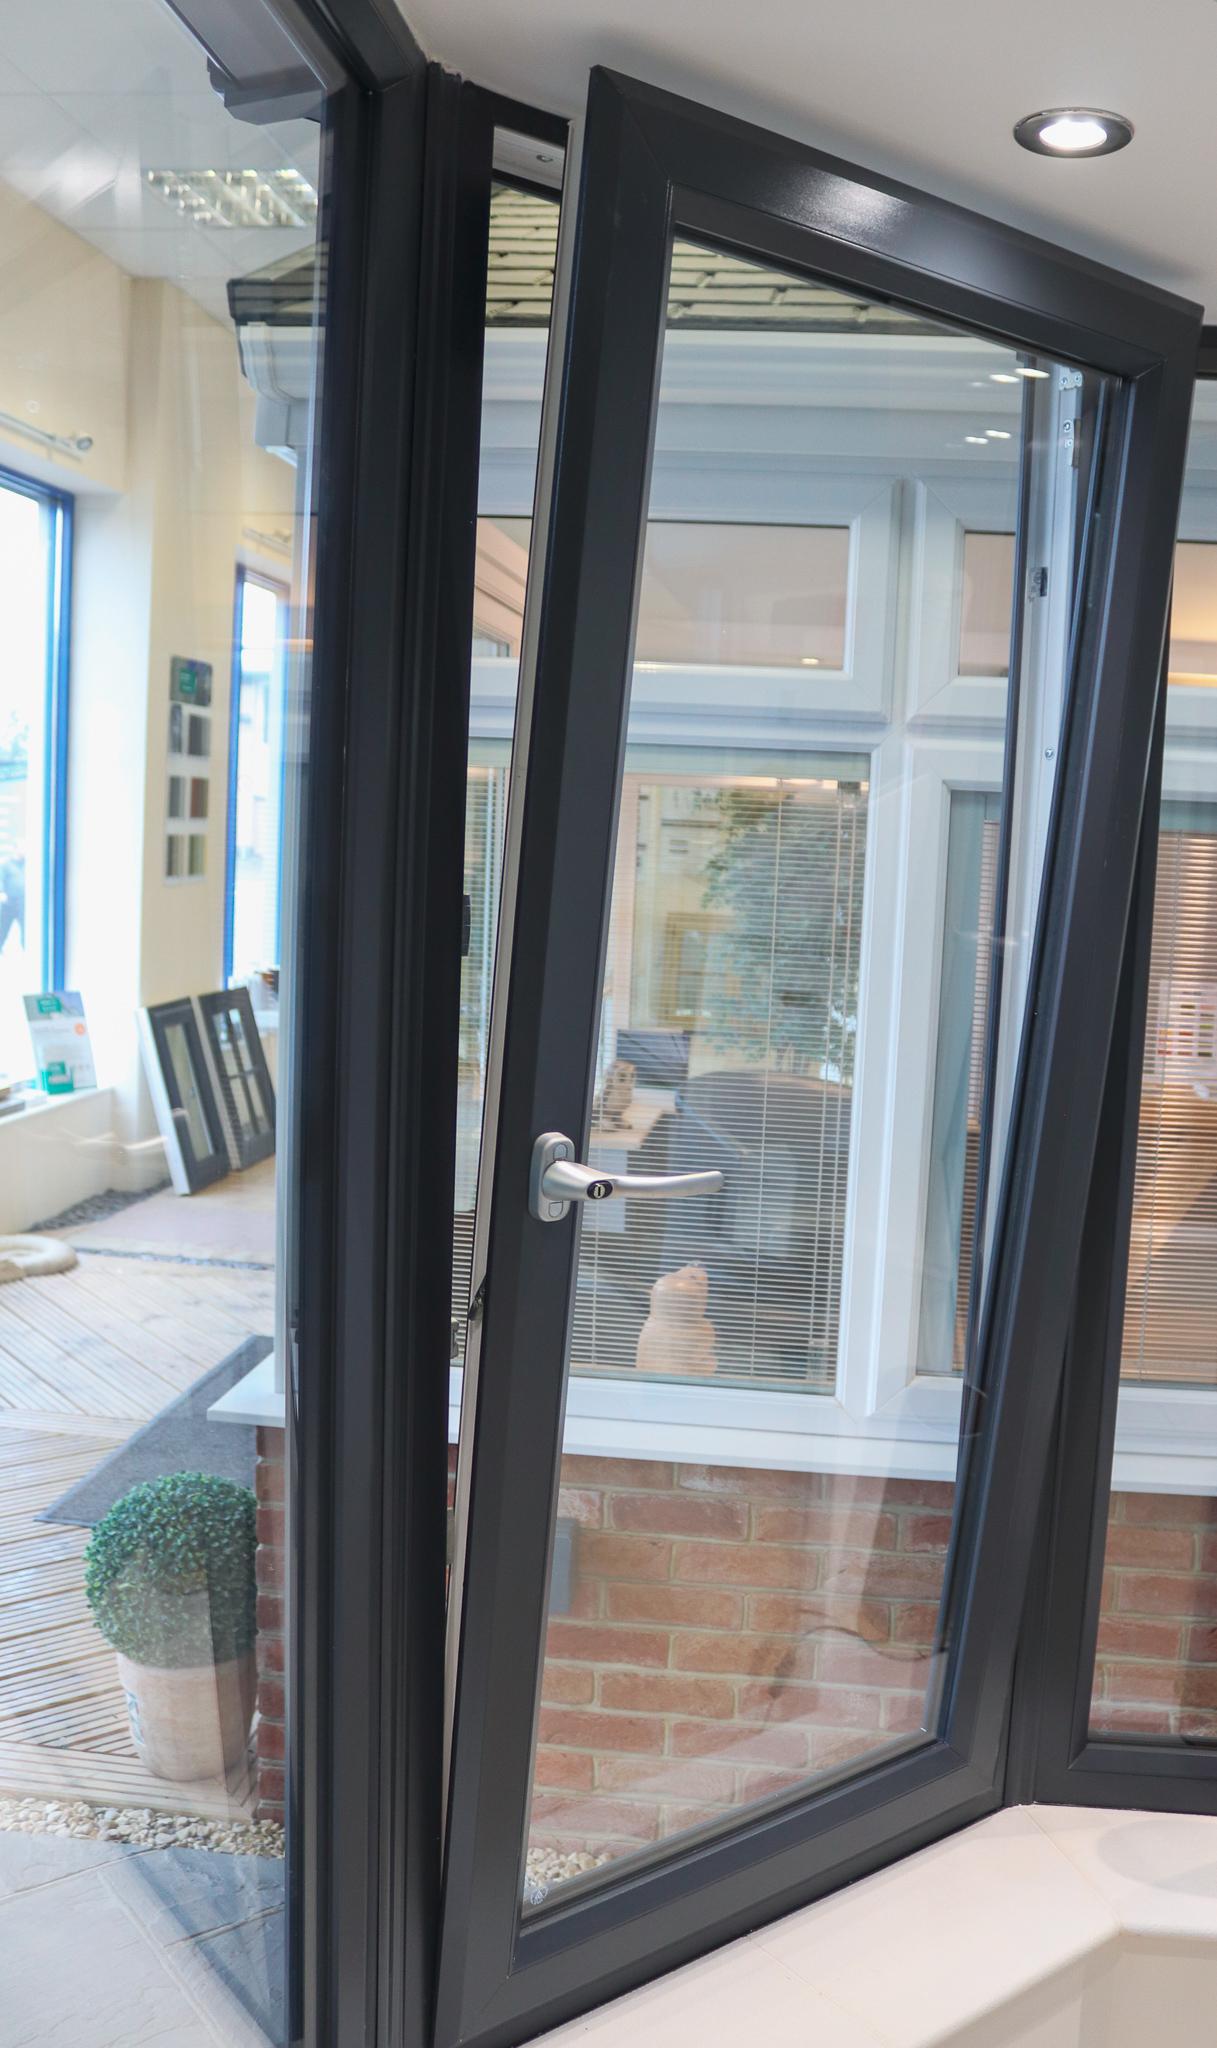 Image of practical window installation.